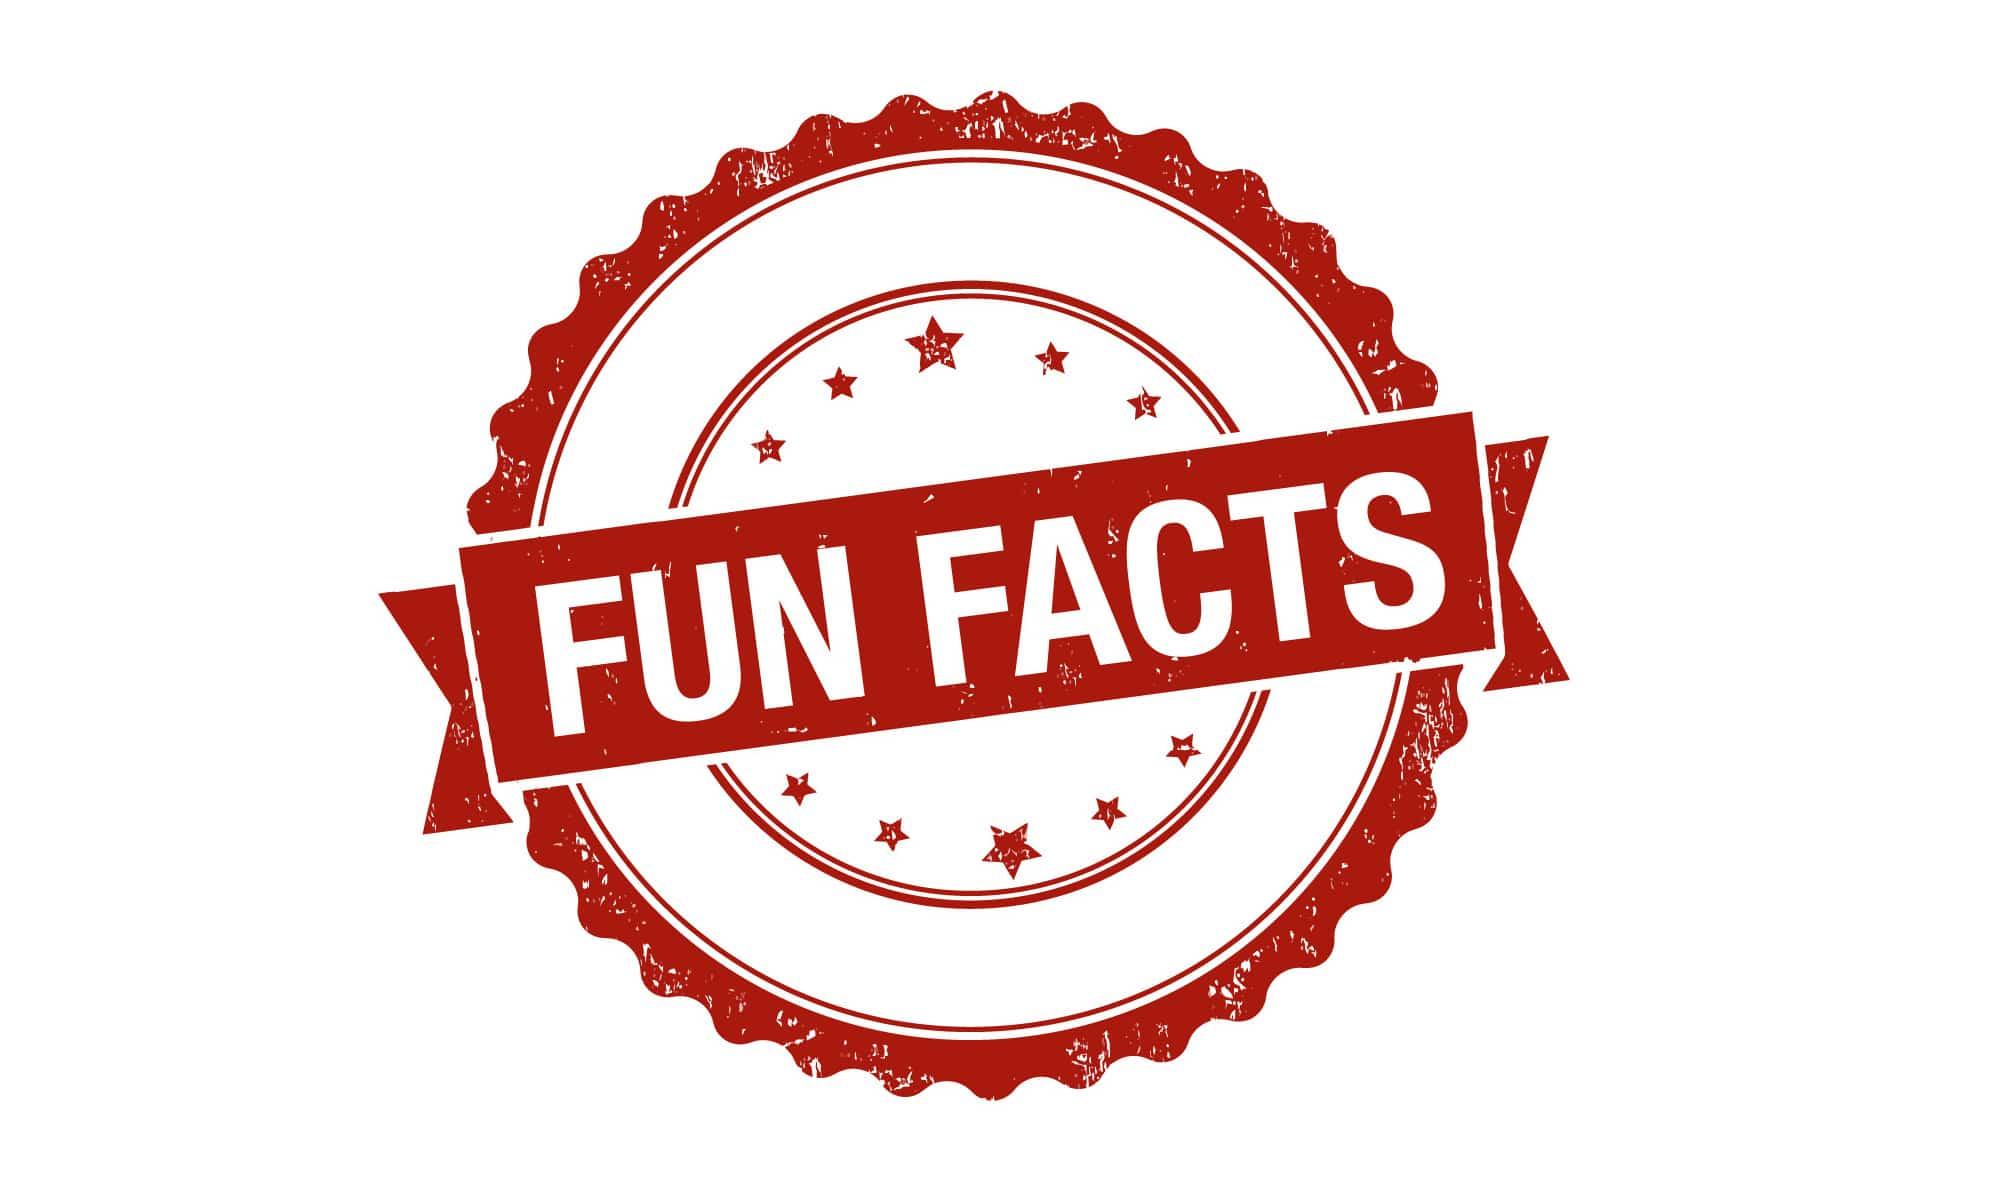 Fun Facts Clipart.